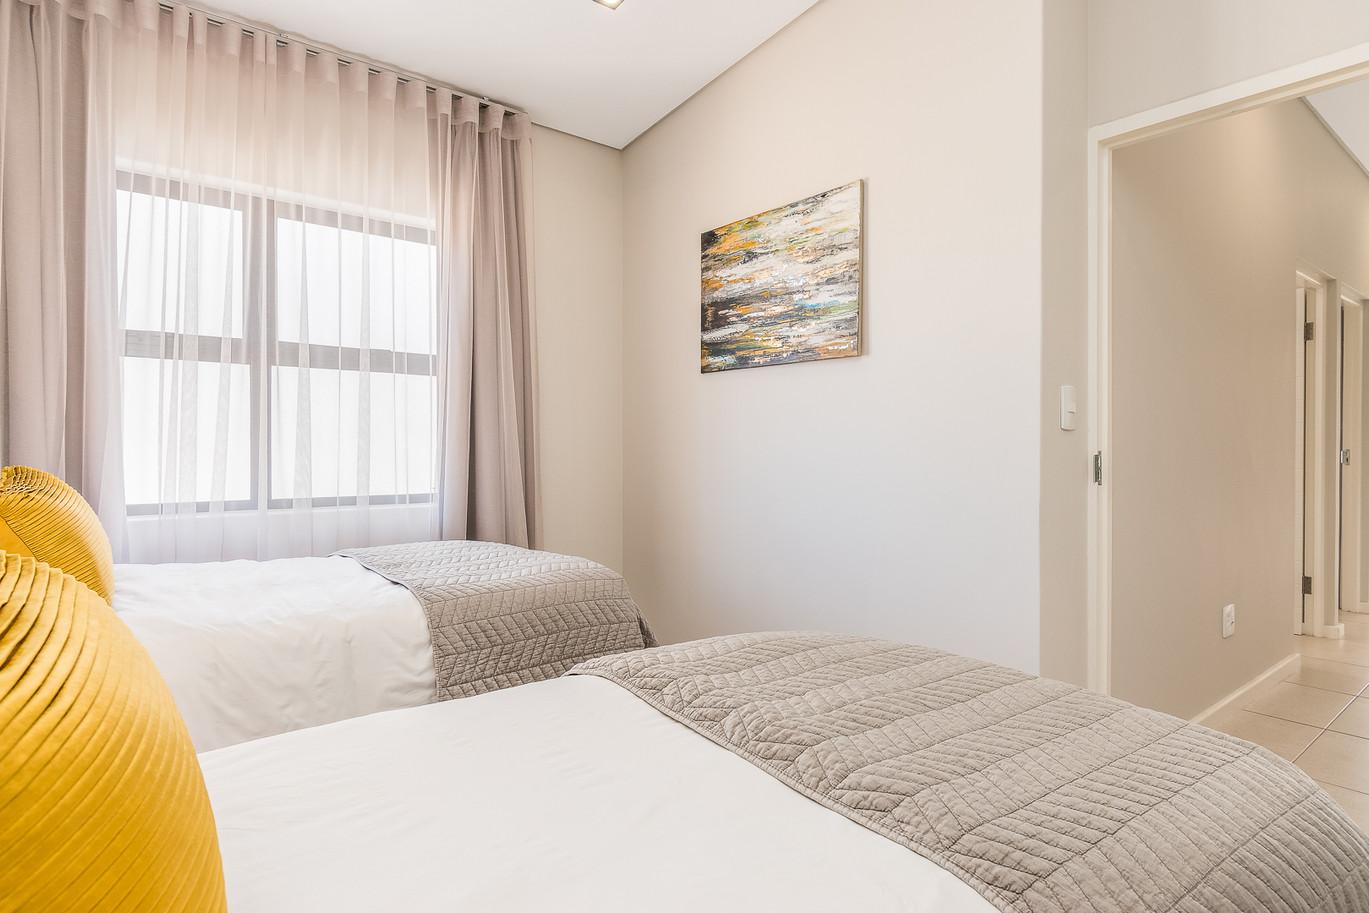 Greystone - Bedroom 2